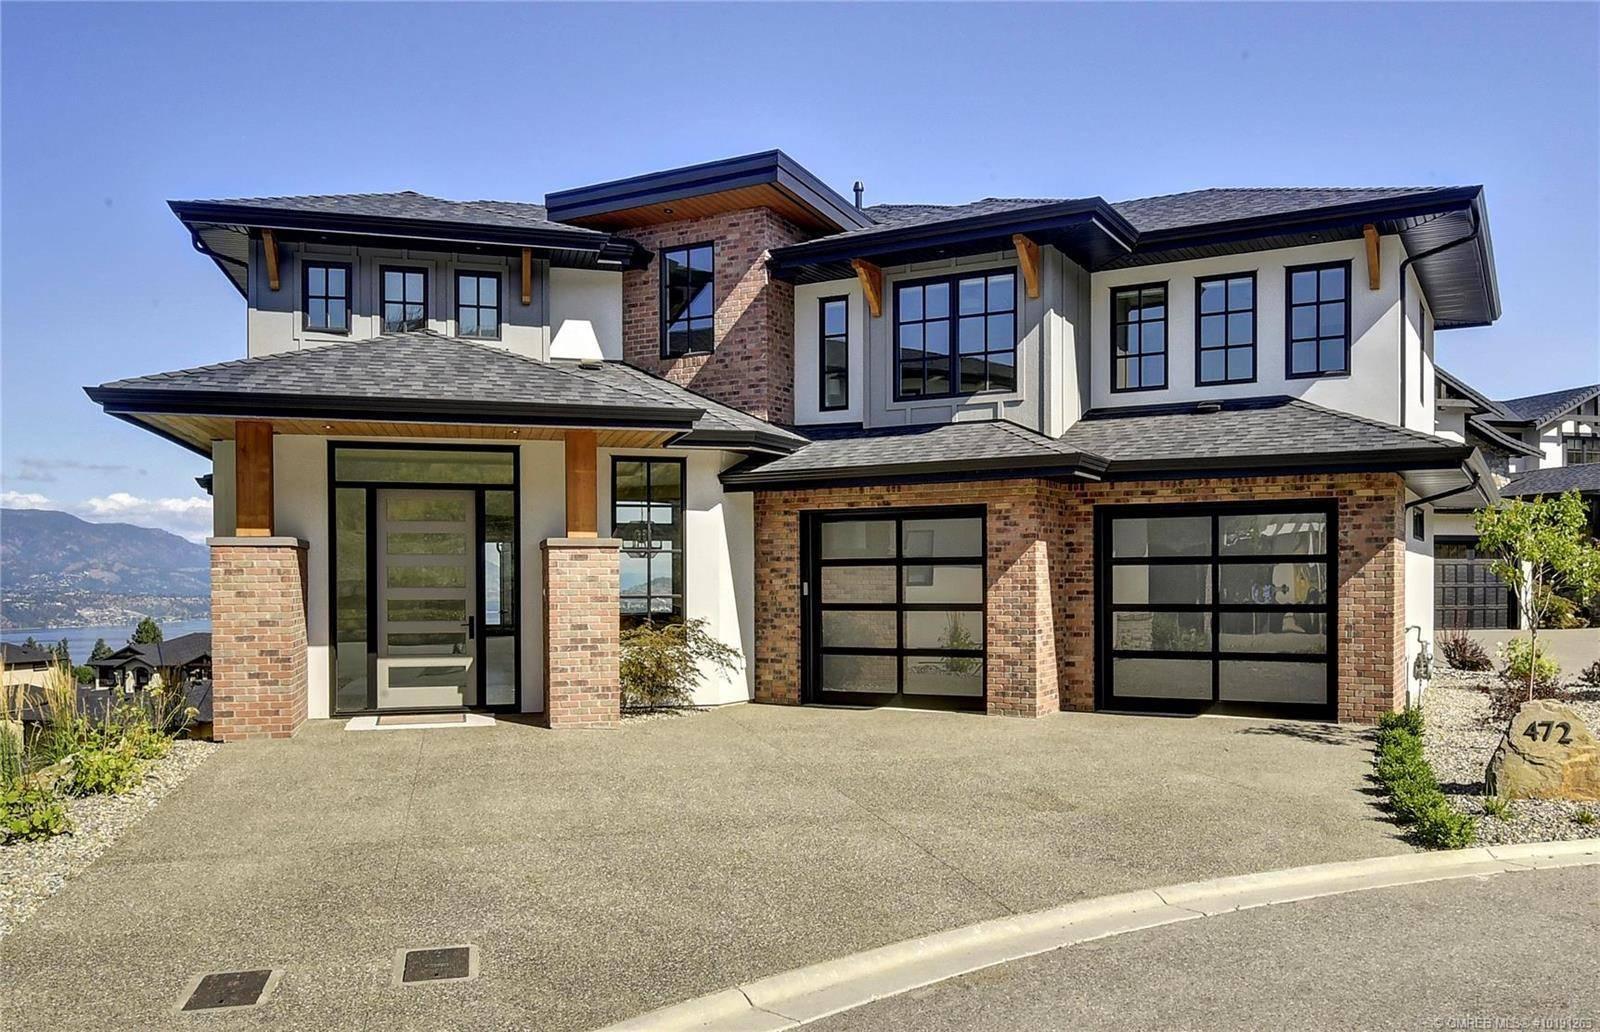 House for sale at 472 Rockview Ln Kelowna British Columbia - MLS: 10191263